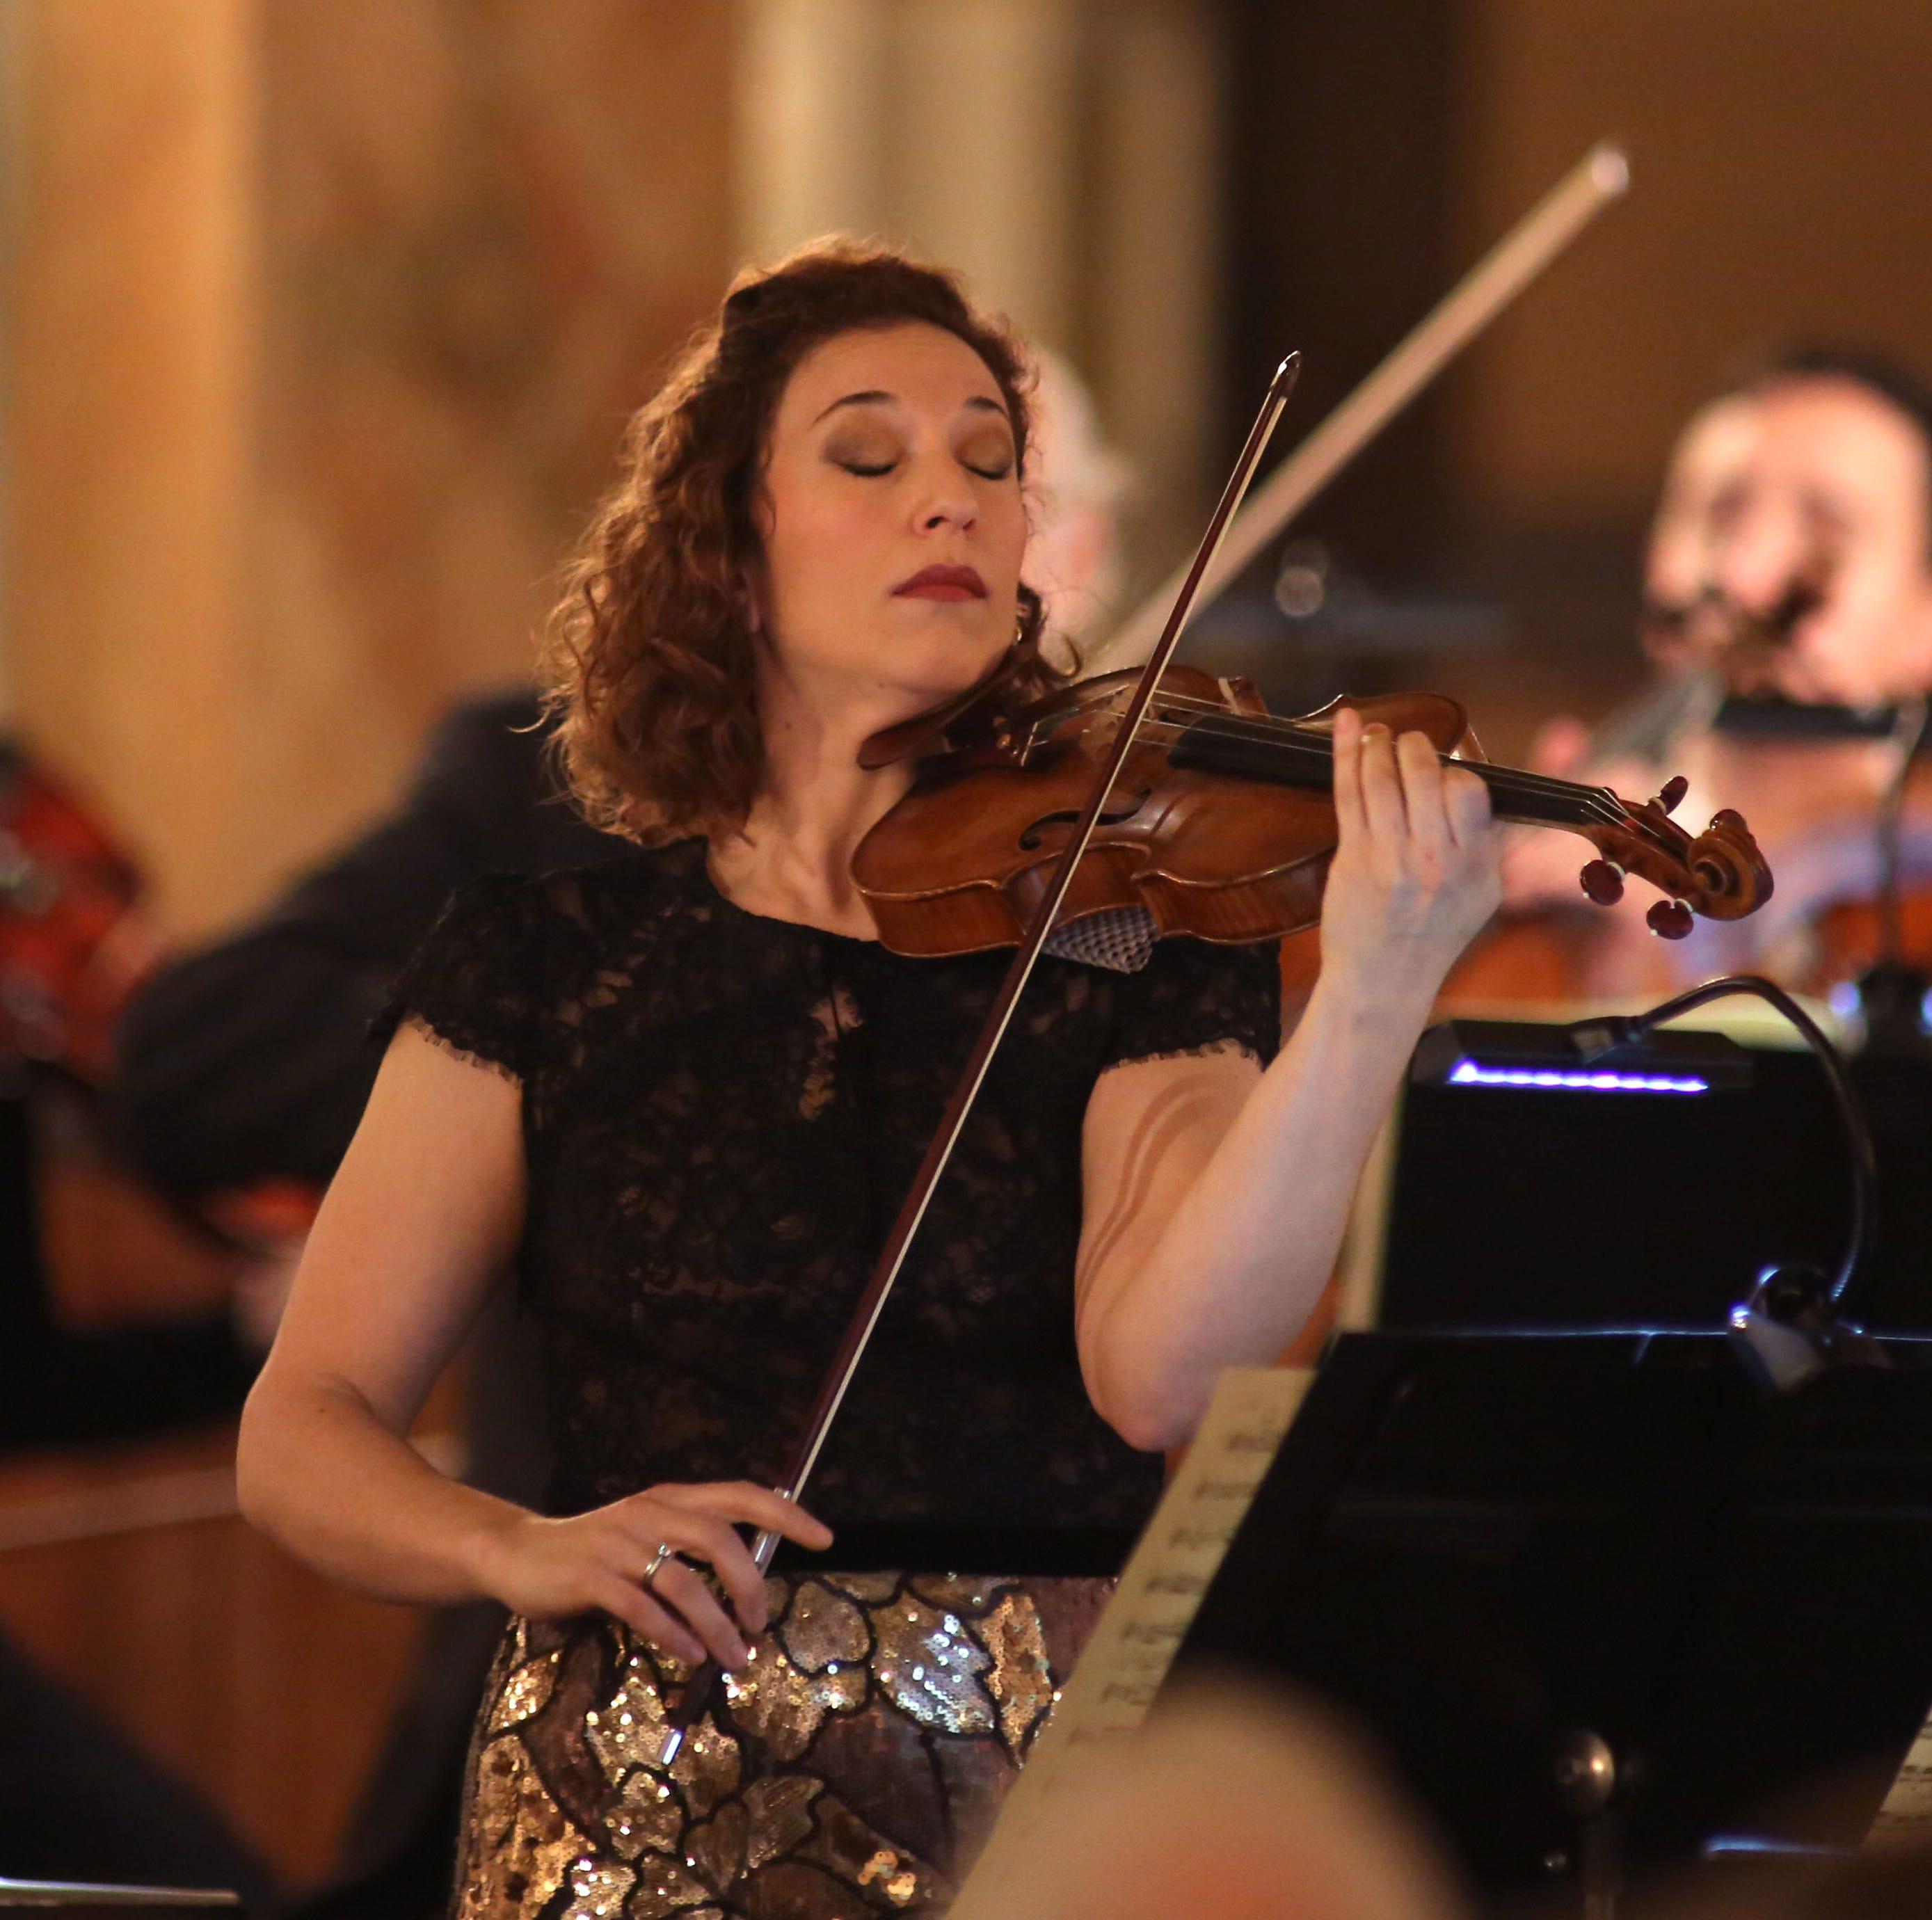 Milwaukee Symphony fills the Basilica of St. Josaphat with sounds of Vivaldi's 'Four Seasons'